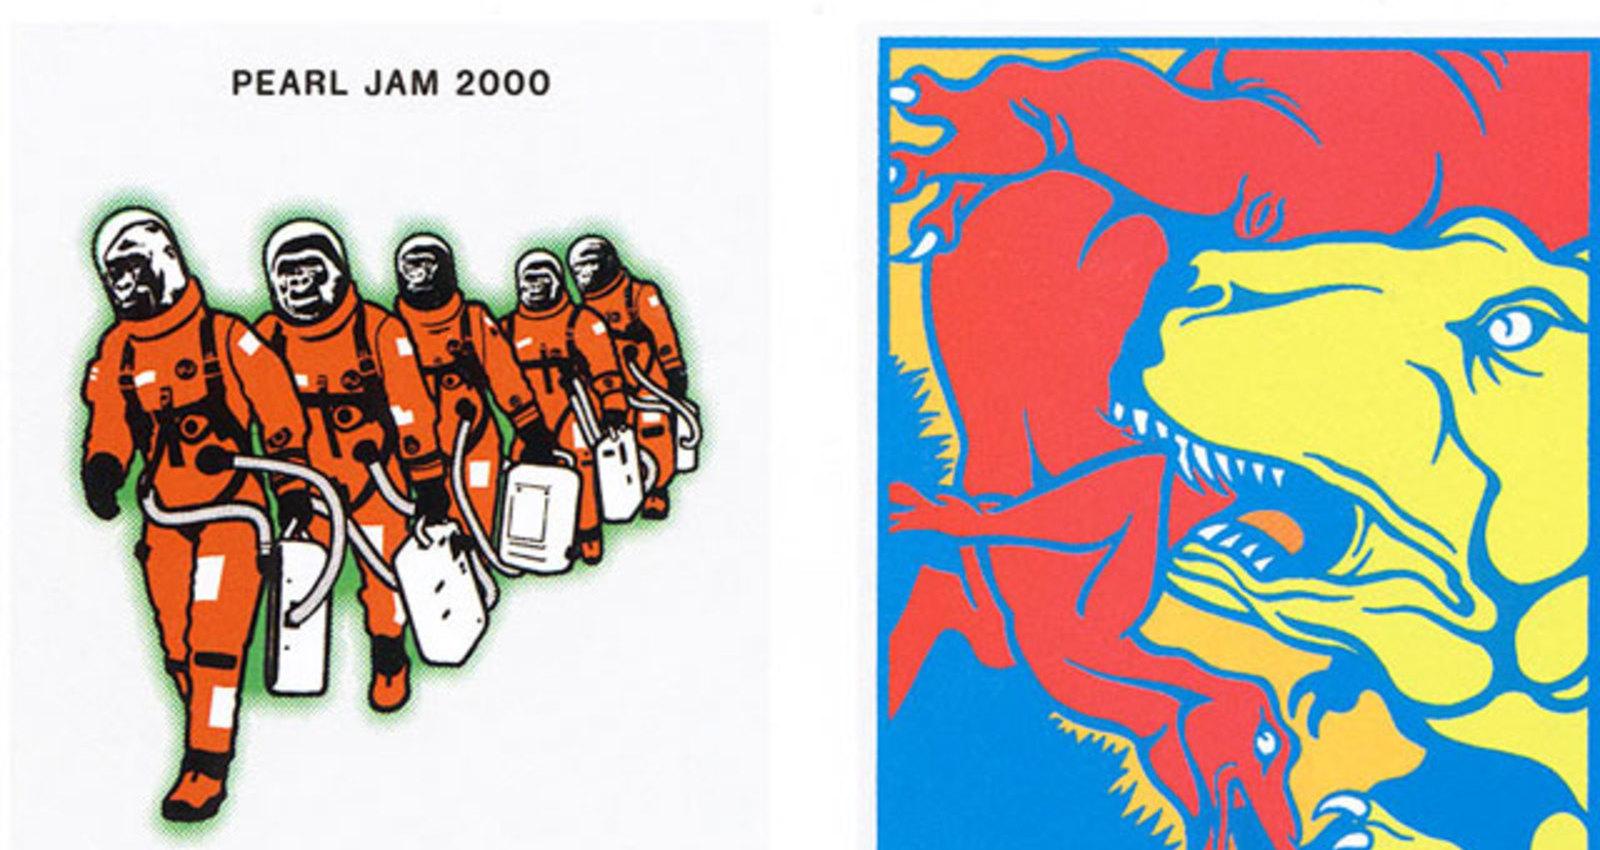 Pearl Jam/Binaural Tour-8 Posters: Virginia Beach, London, Lisbon, Prague, San Francisco, Maastricht, New York, Stockholm